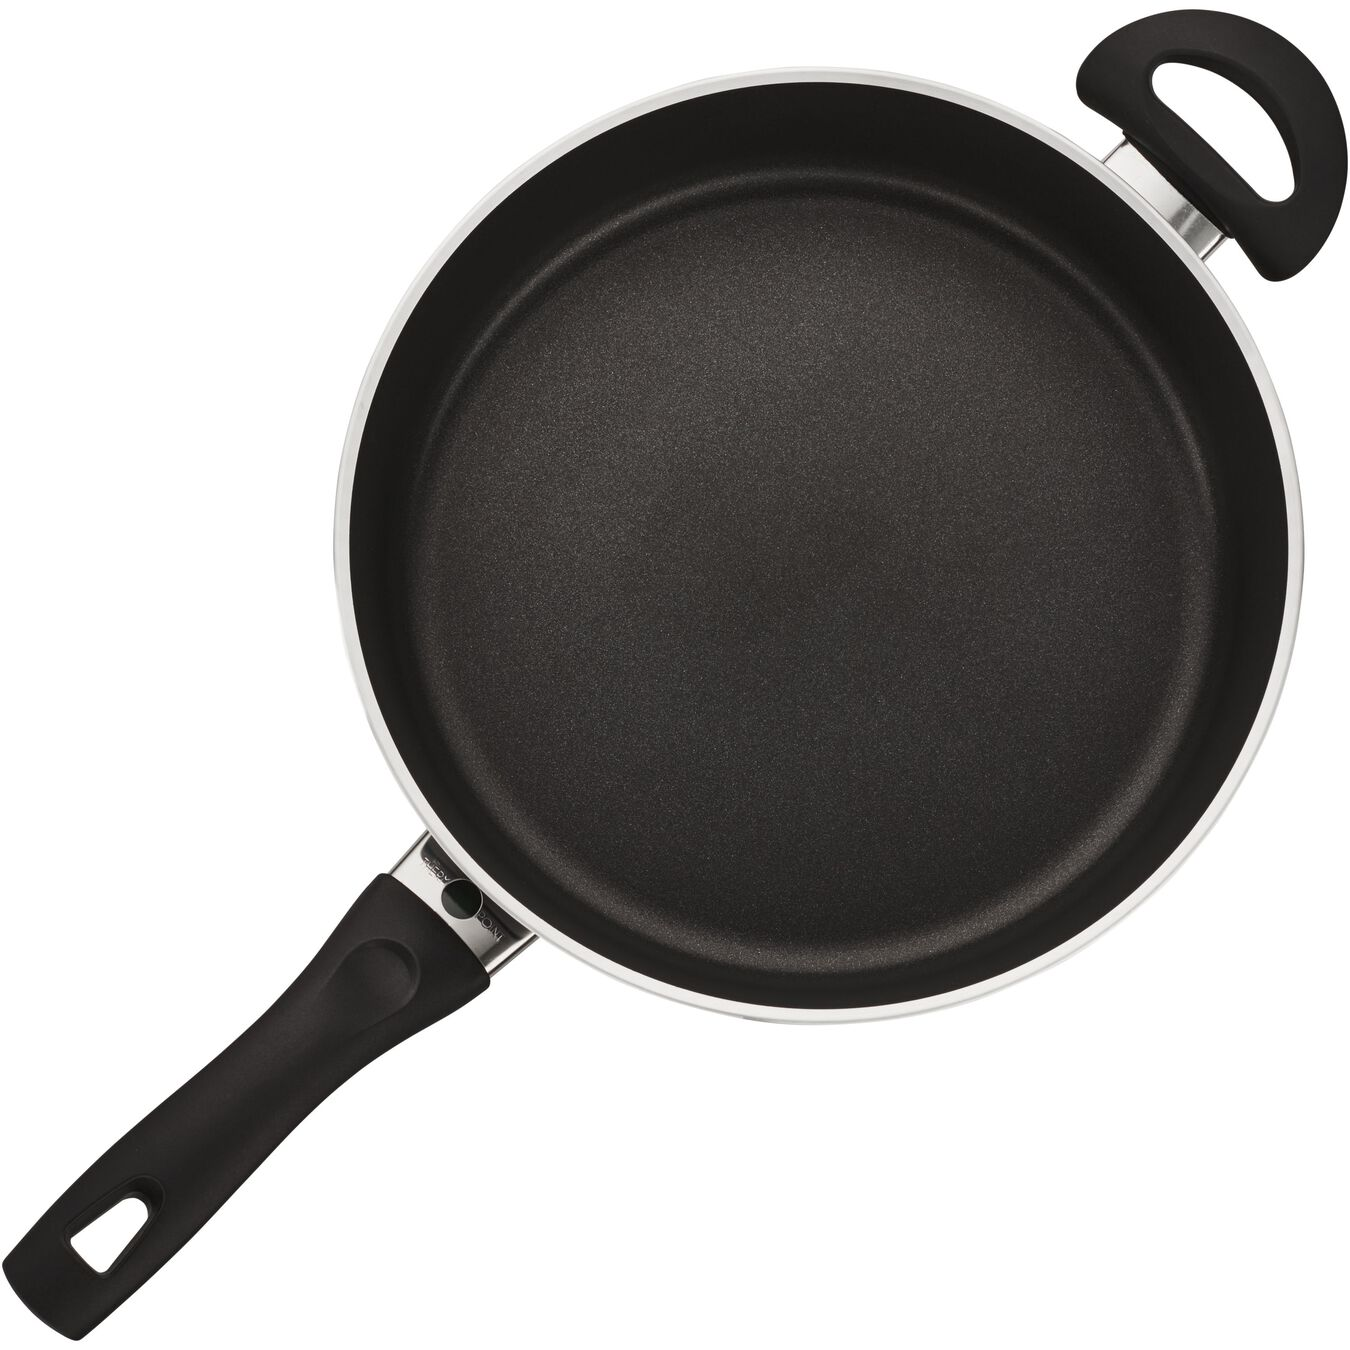 3.8-qt Nonstick Saute Pan with Lid,,large 1